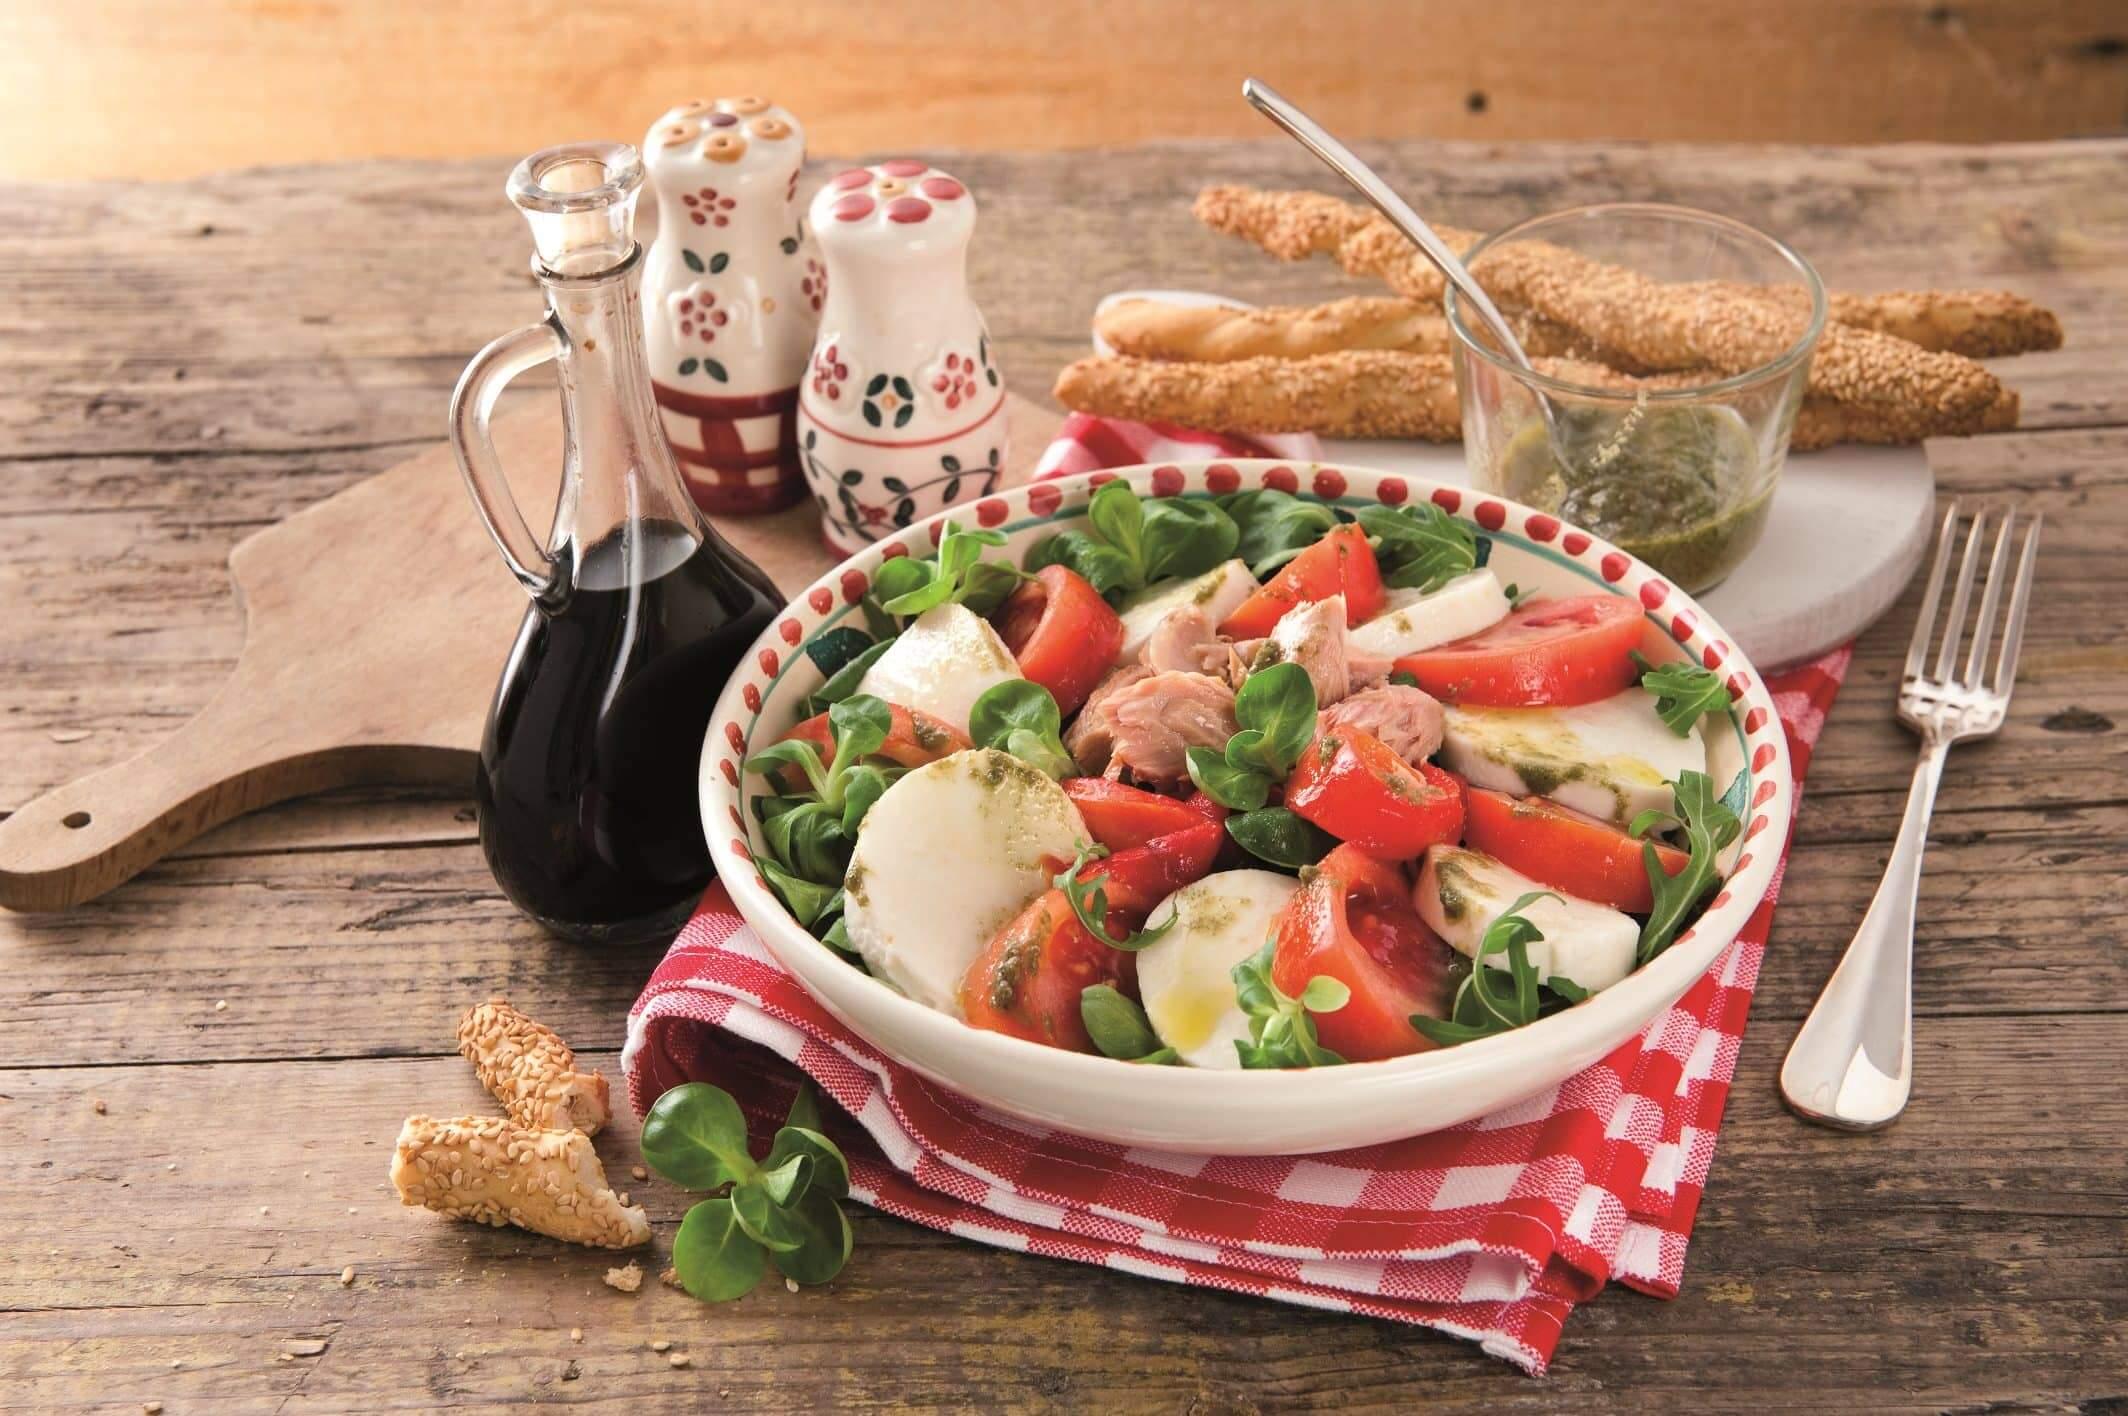 Galbani Mozzarella Caprese Salad with Tuna - Galbani